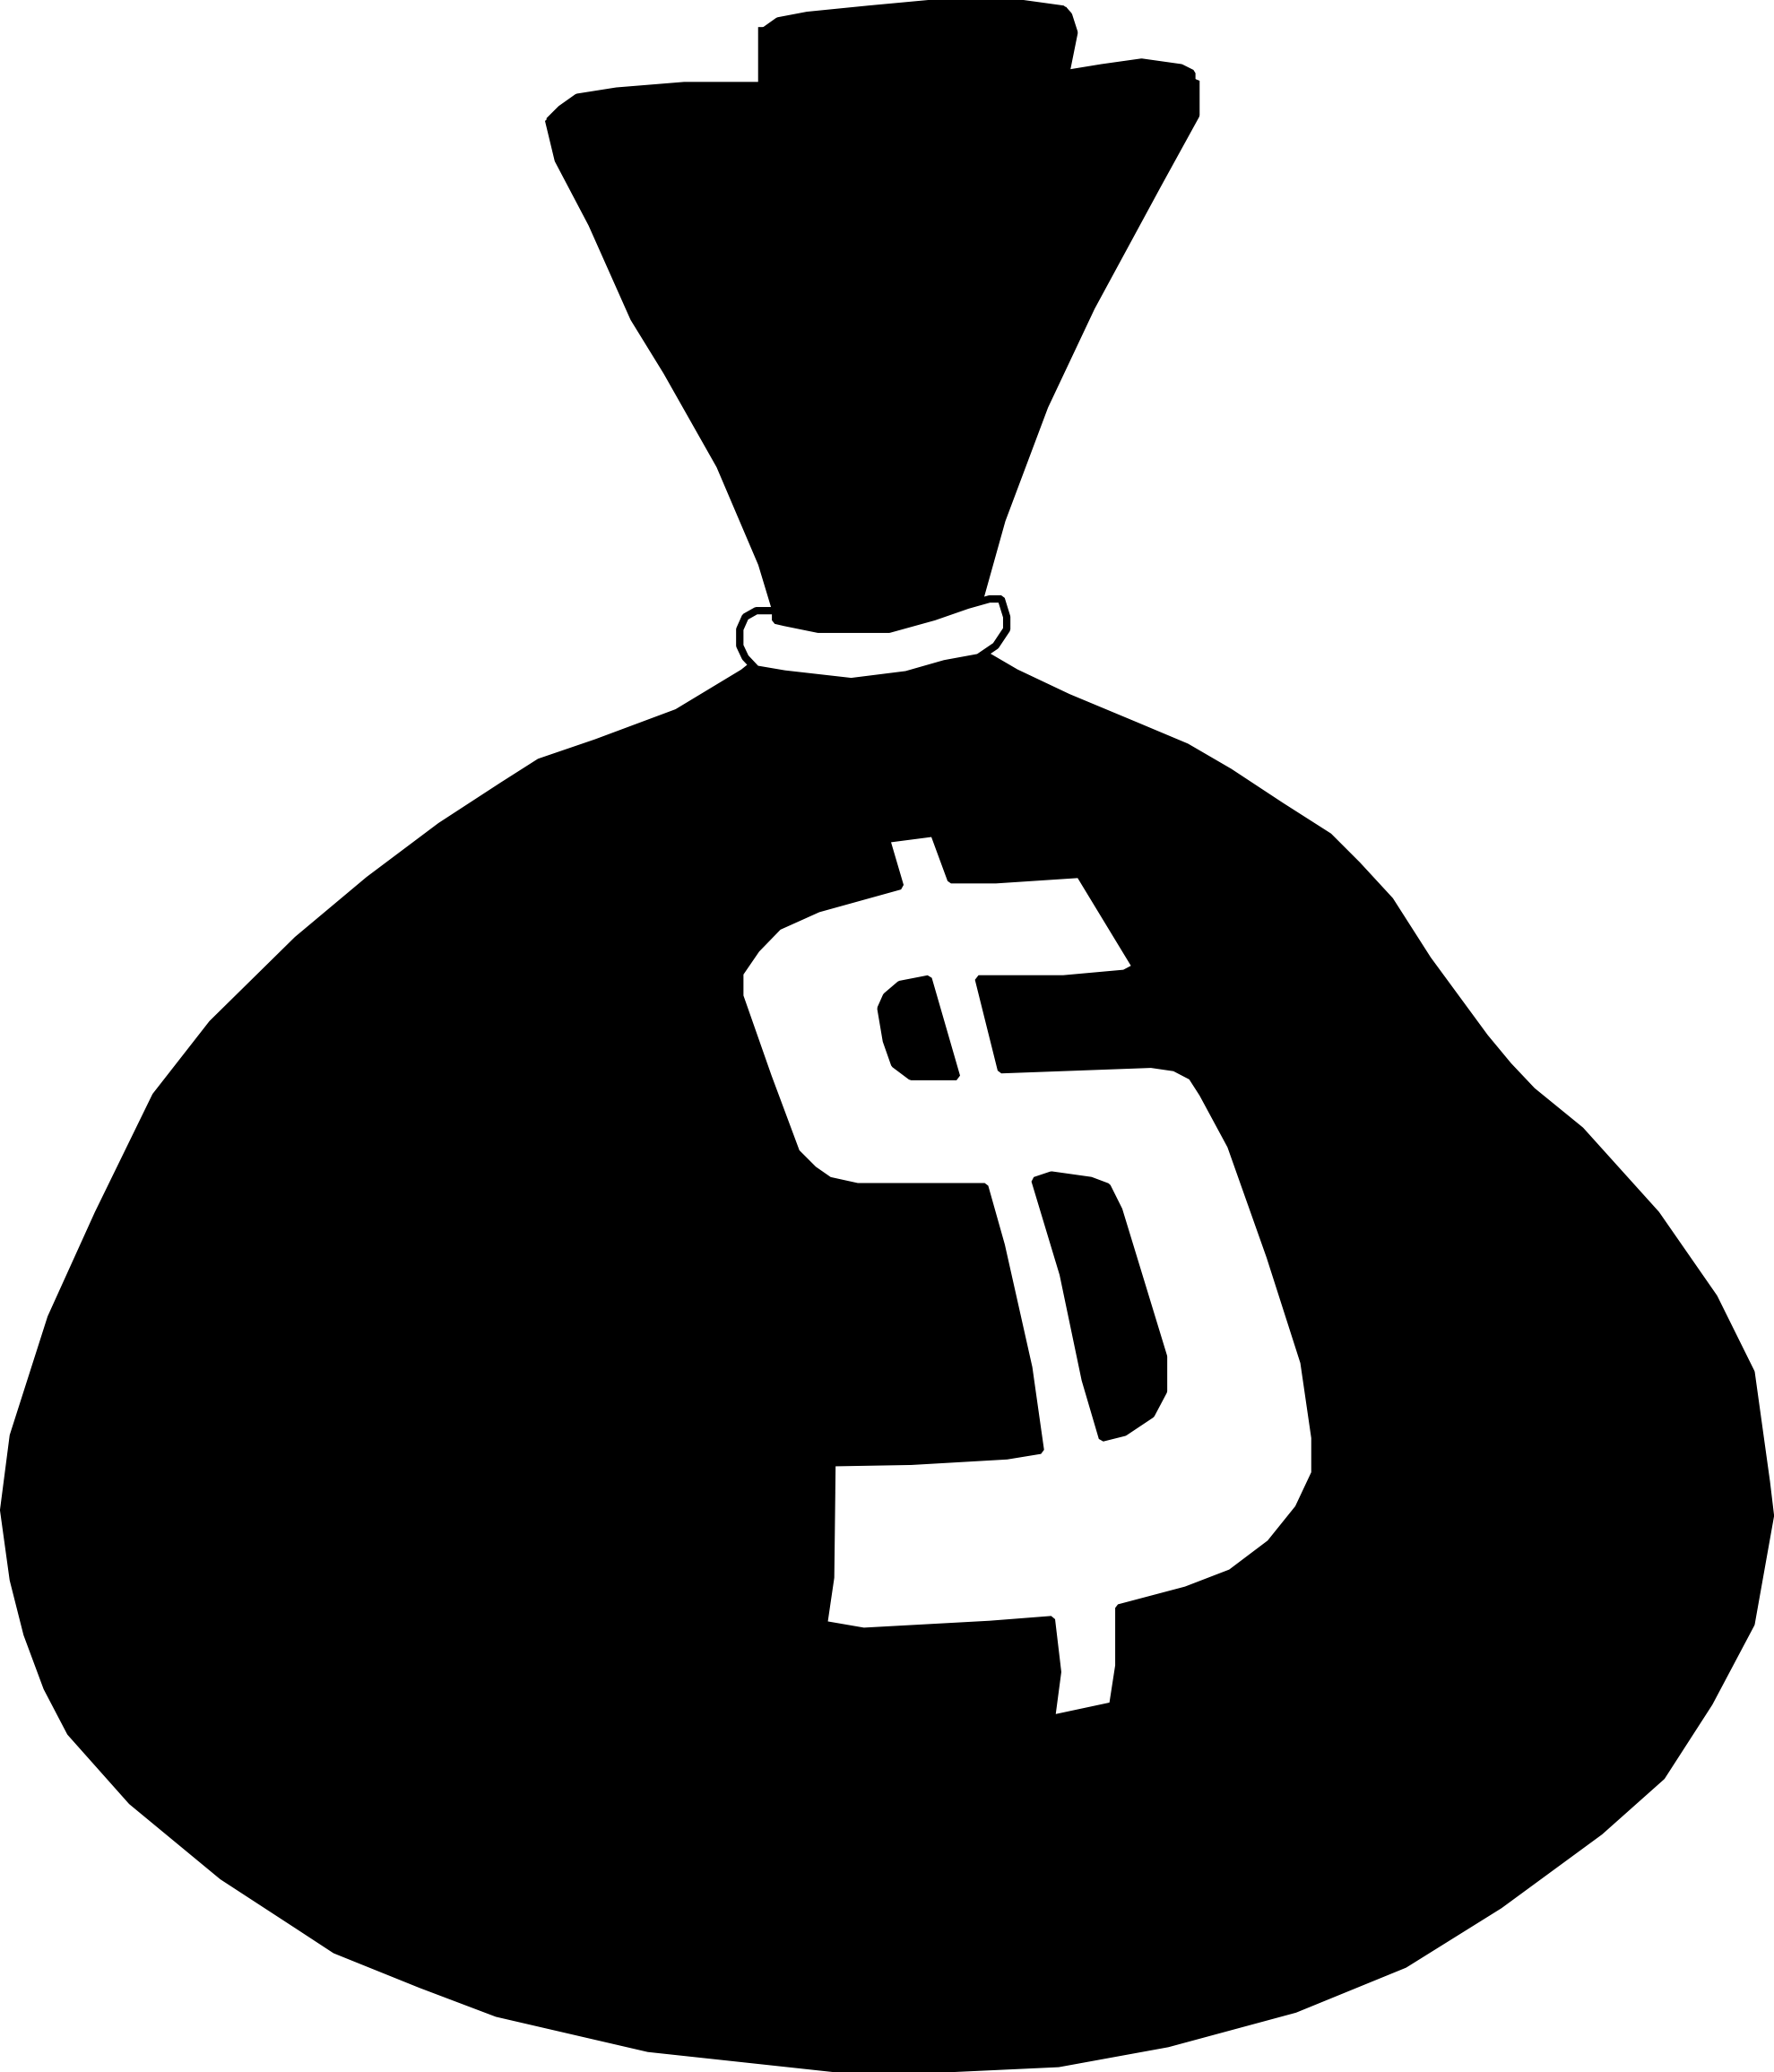 open-money-bag-clipart-money bag-1979px pngMoney Bag Clipart Black And White